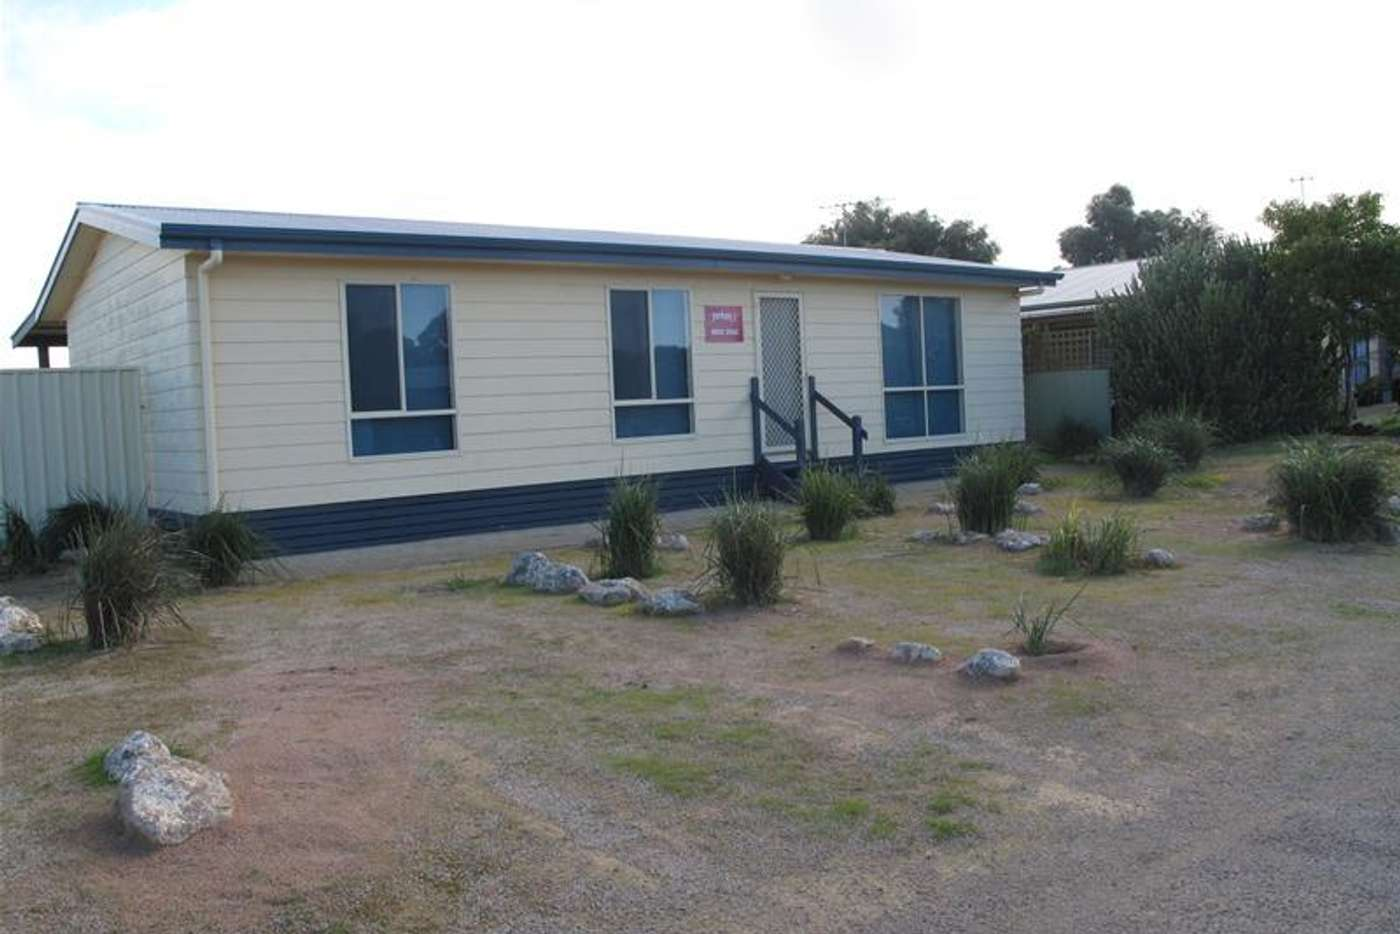 Main view of Homely house listing, 18 Kona Crescent, Edithburgh SA 5583